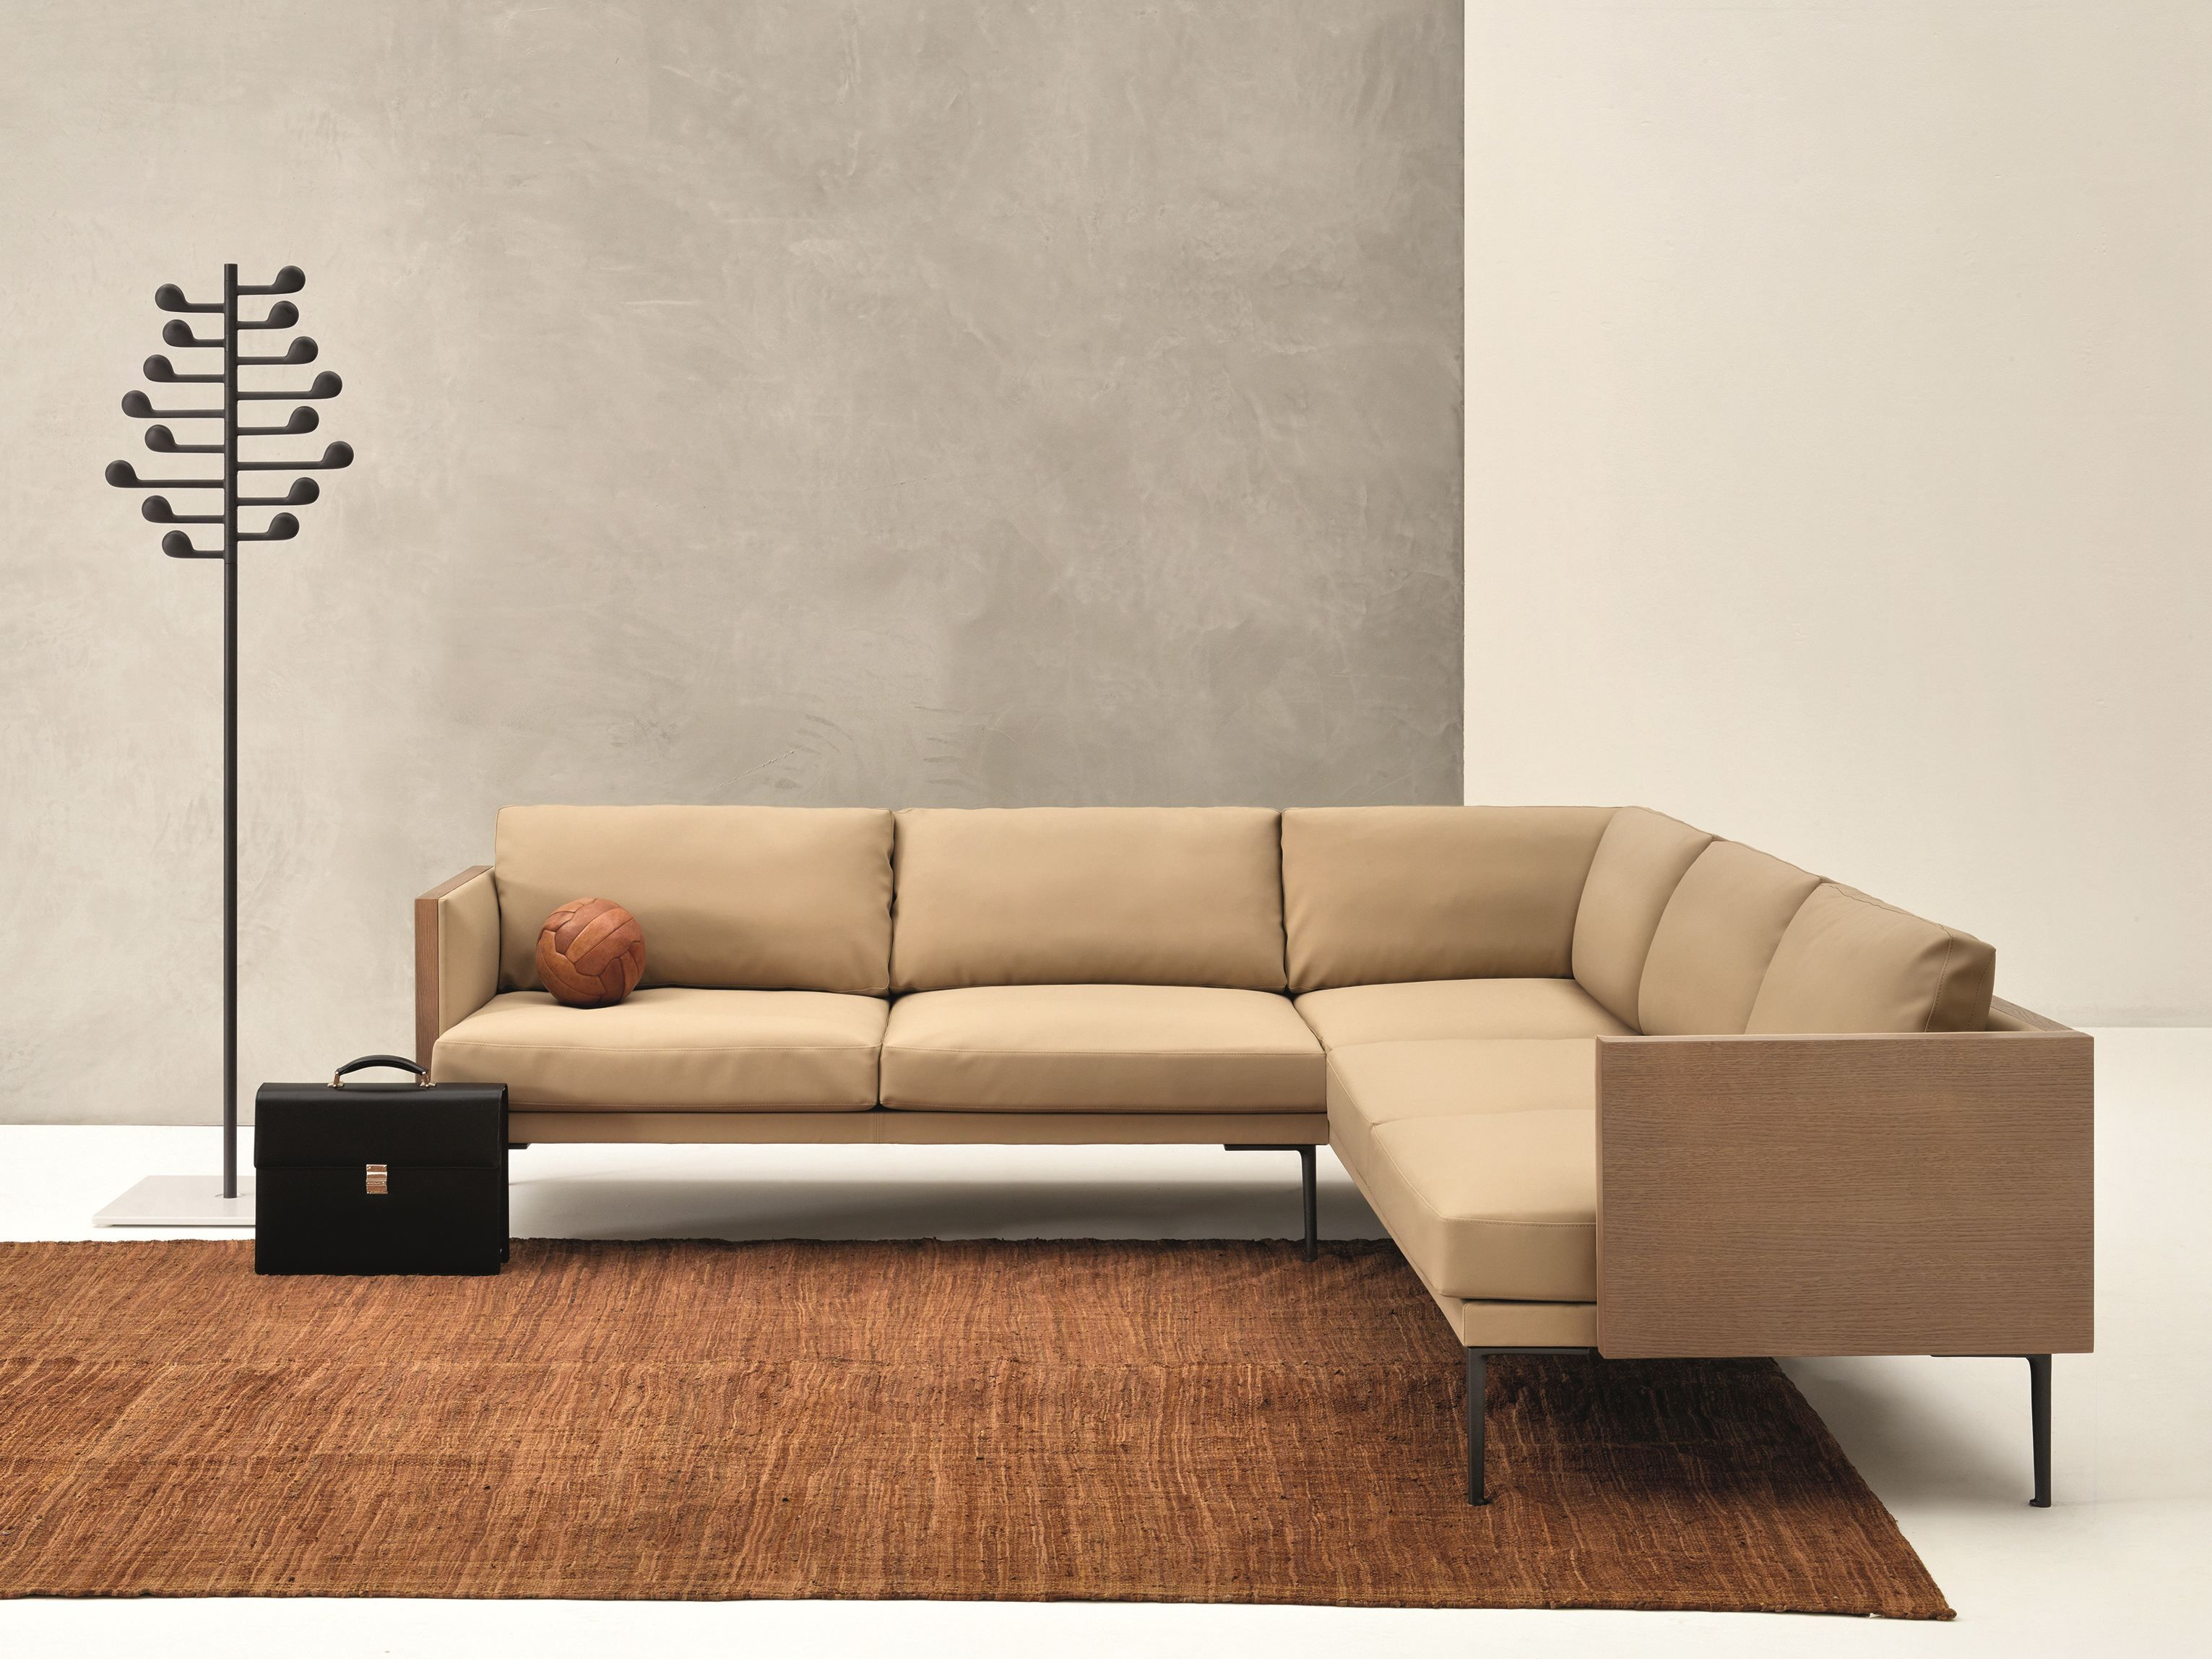 STEEVE Sofá modular by Arper diseño Jean-Marie Massaud | Some Stuff ...